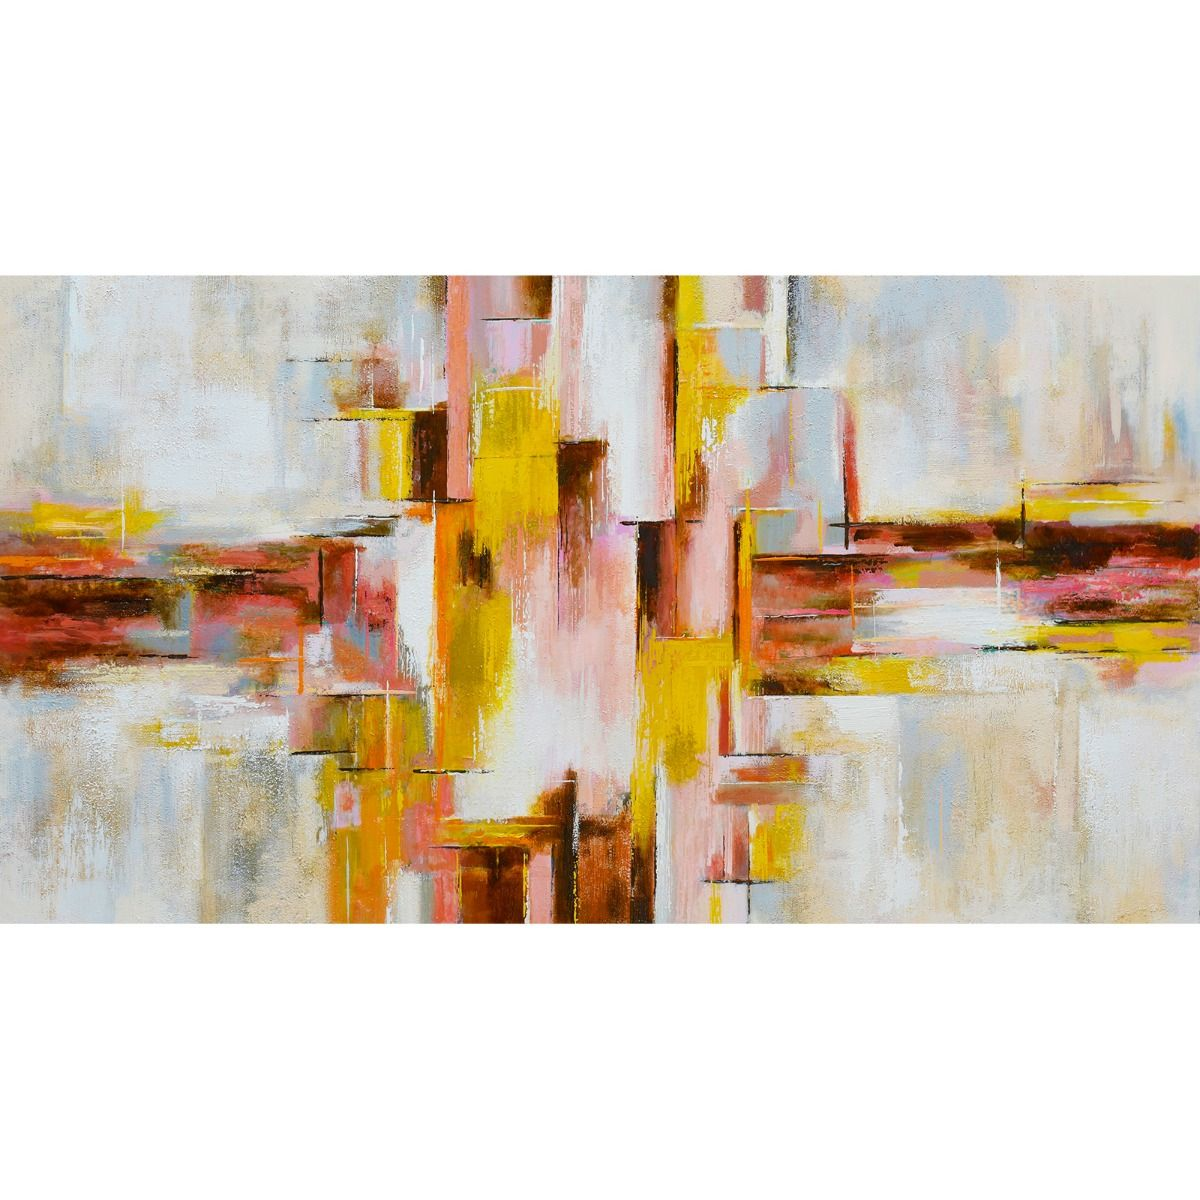 Serie ABSTRACTO | Cuadro abstracto rosa (180 x 97 cm)